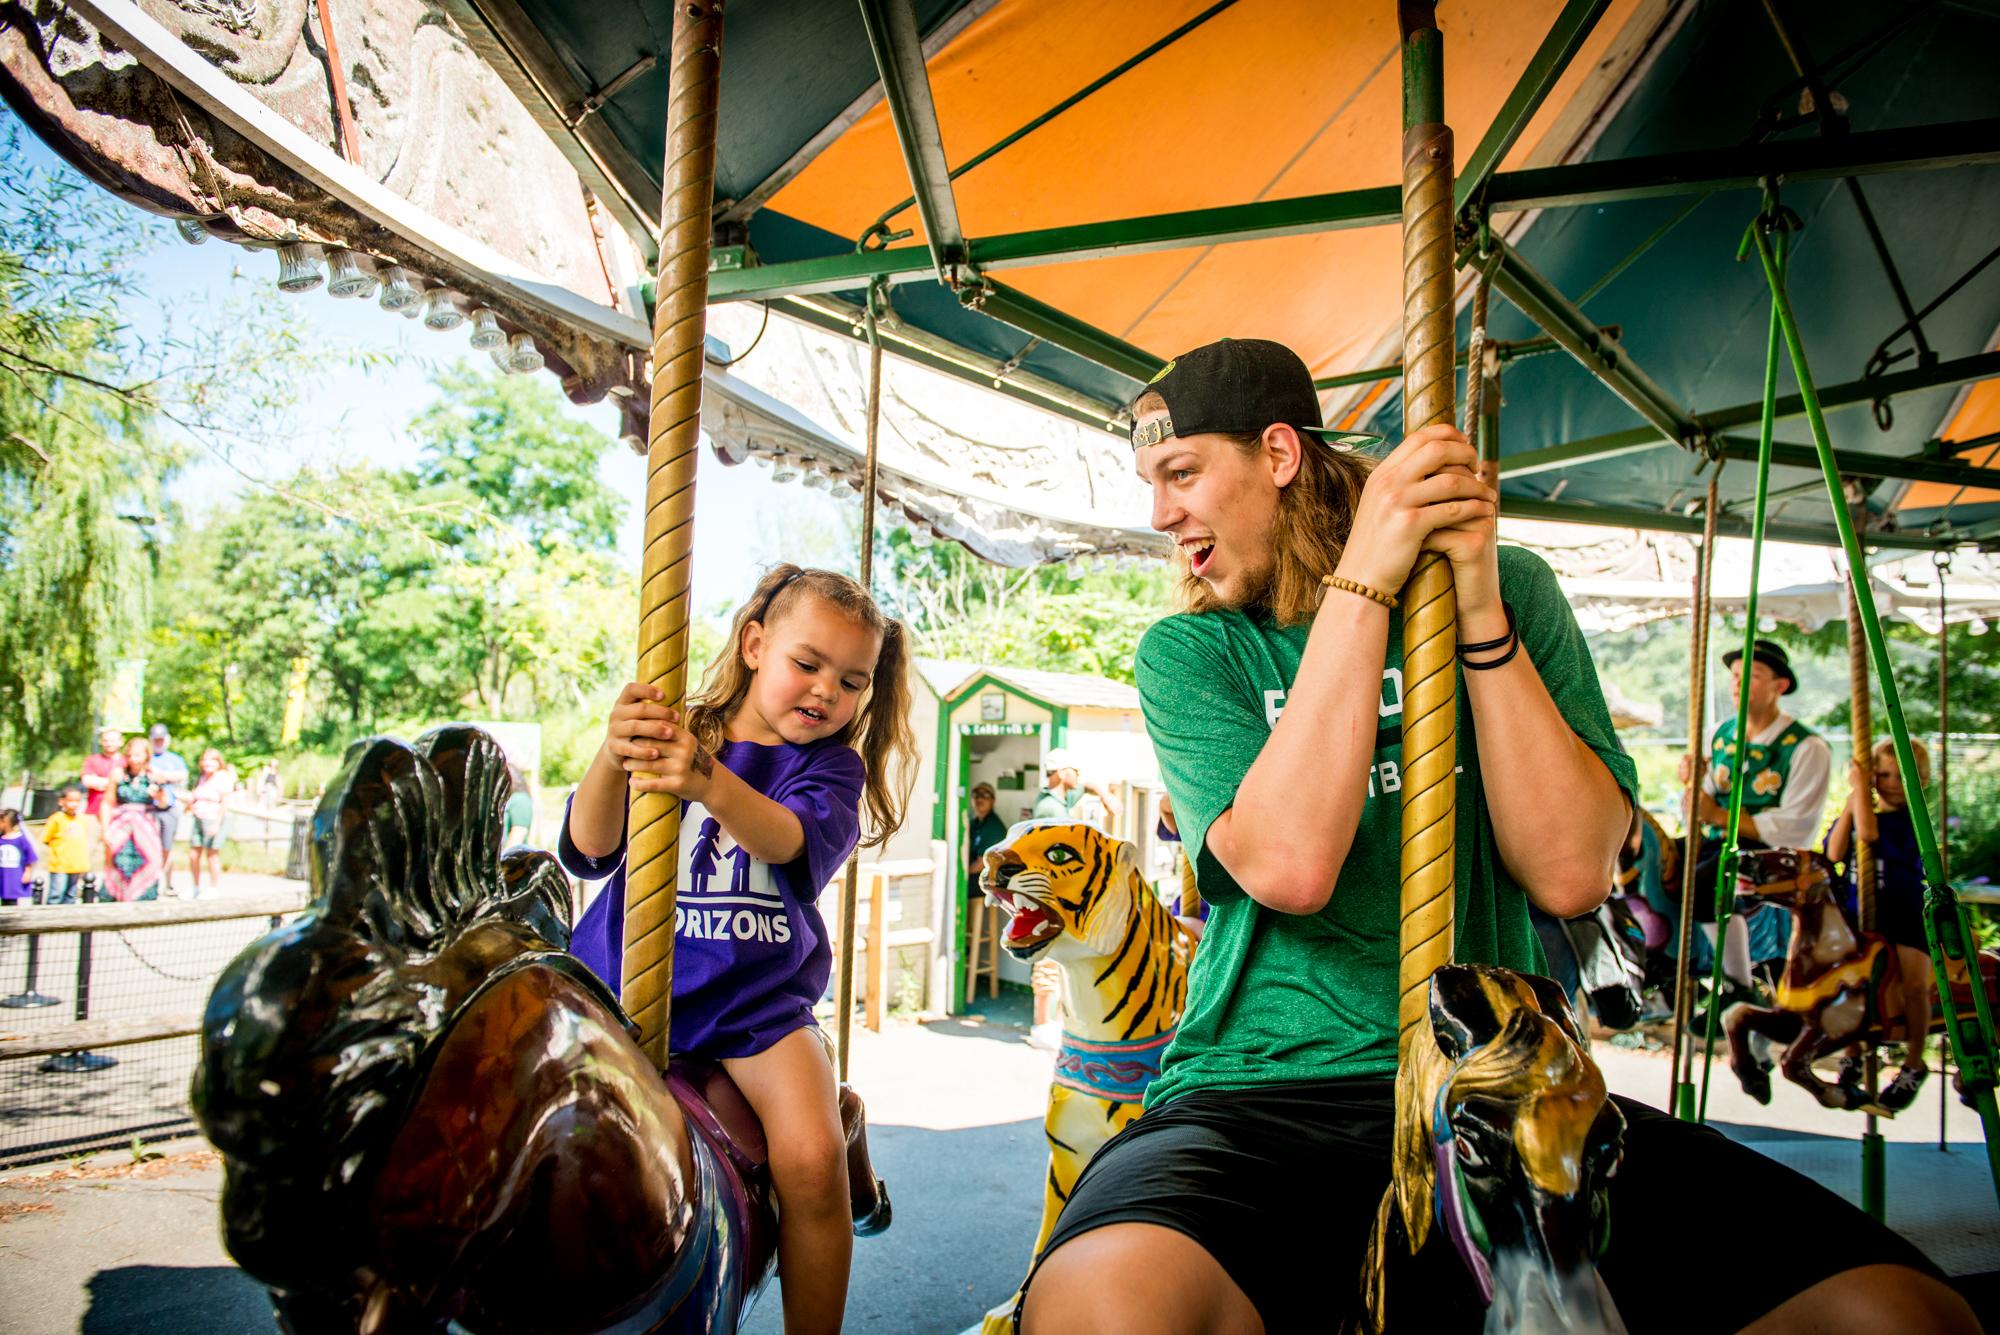 Kelly Olynyk at Franklin Park Zoo